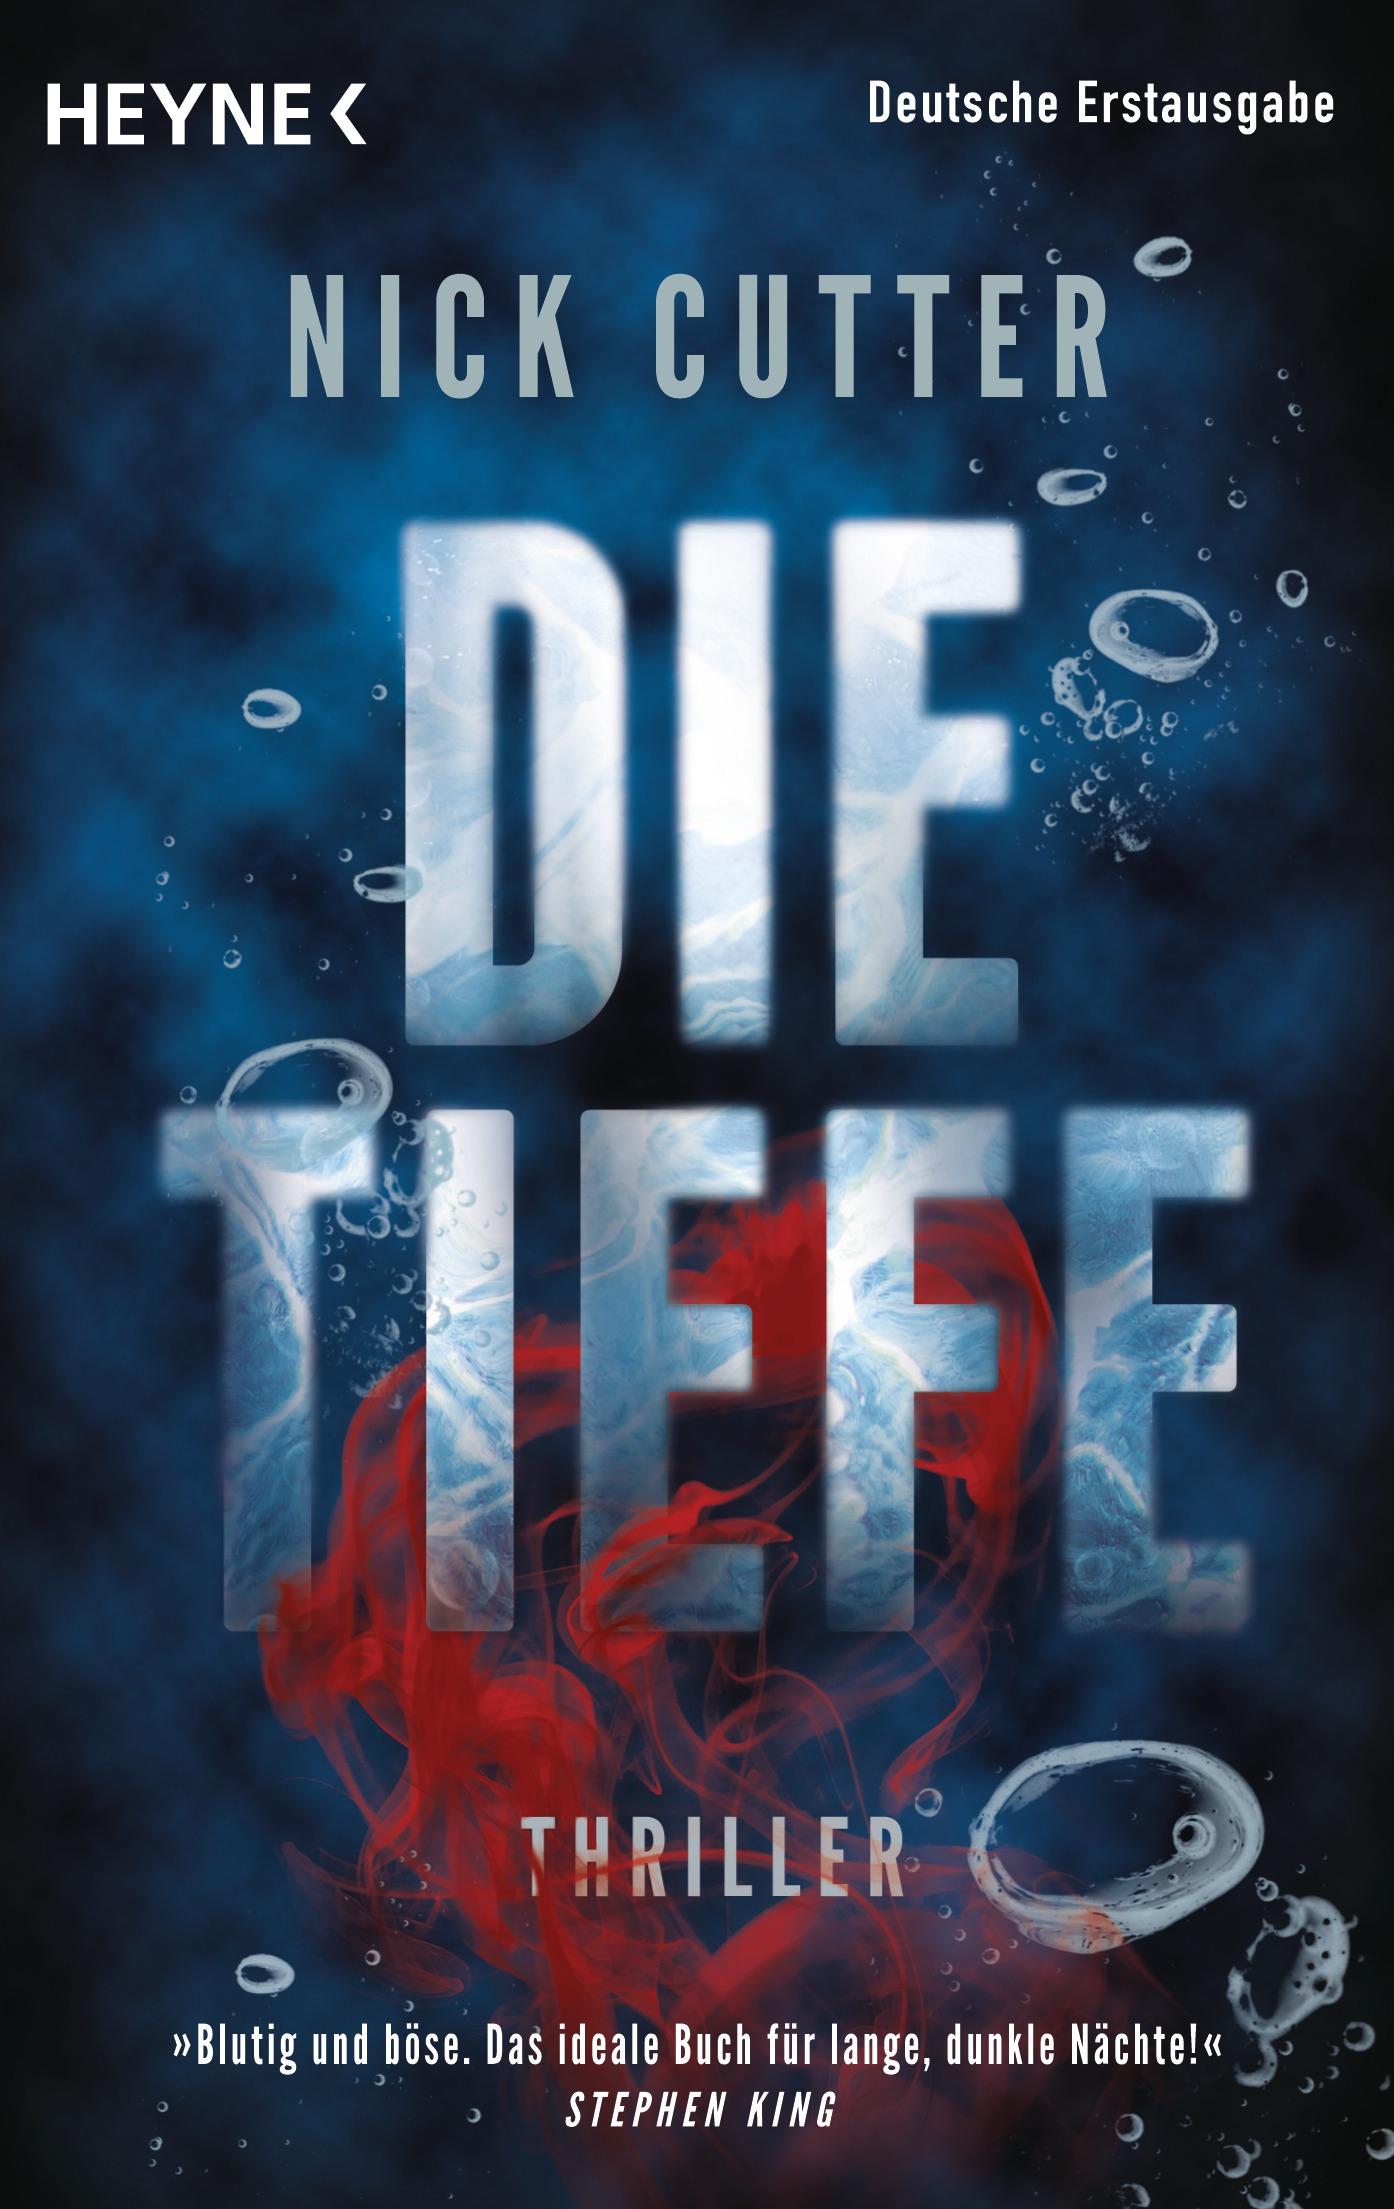 REZENSION]: Nick Cutter: Die Tiefe | Kultplatz.net